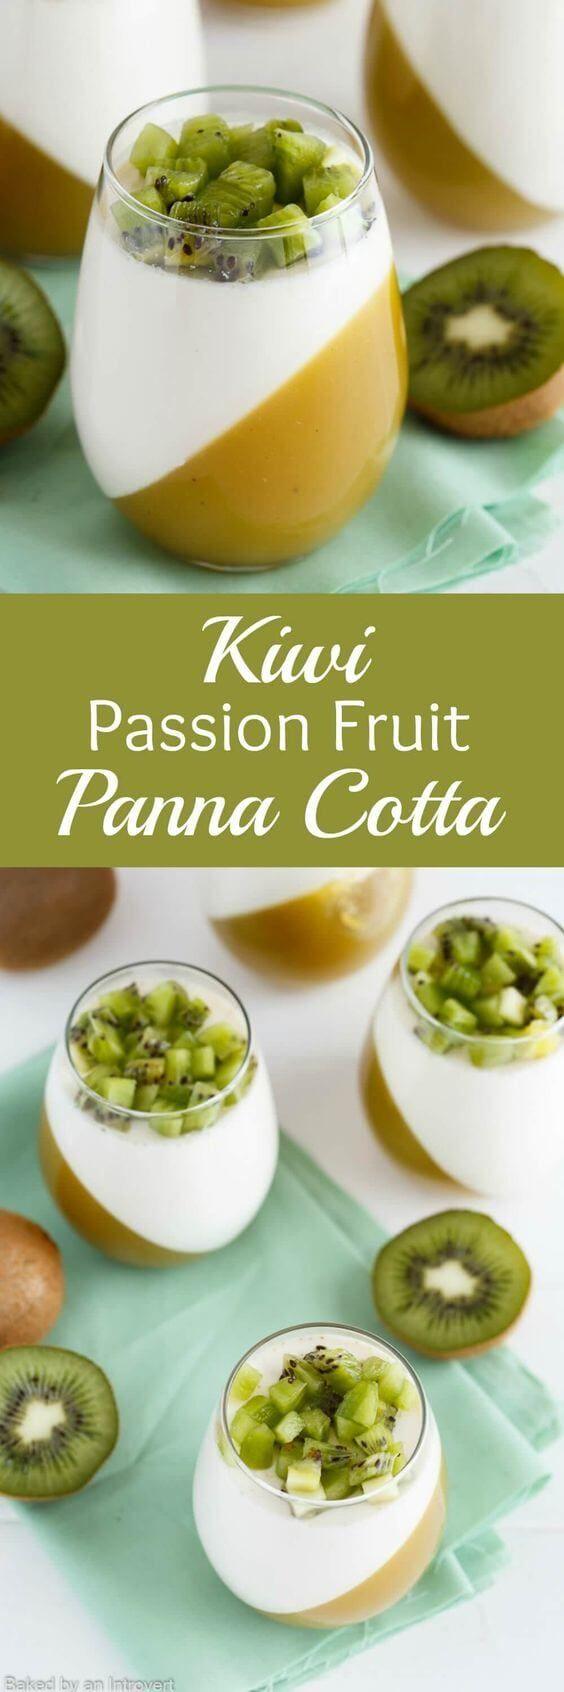 nice Kiwi Passion Fruit Panna Cotta